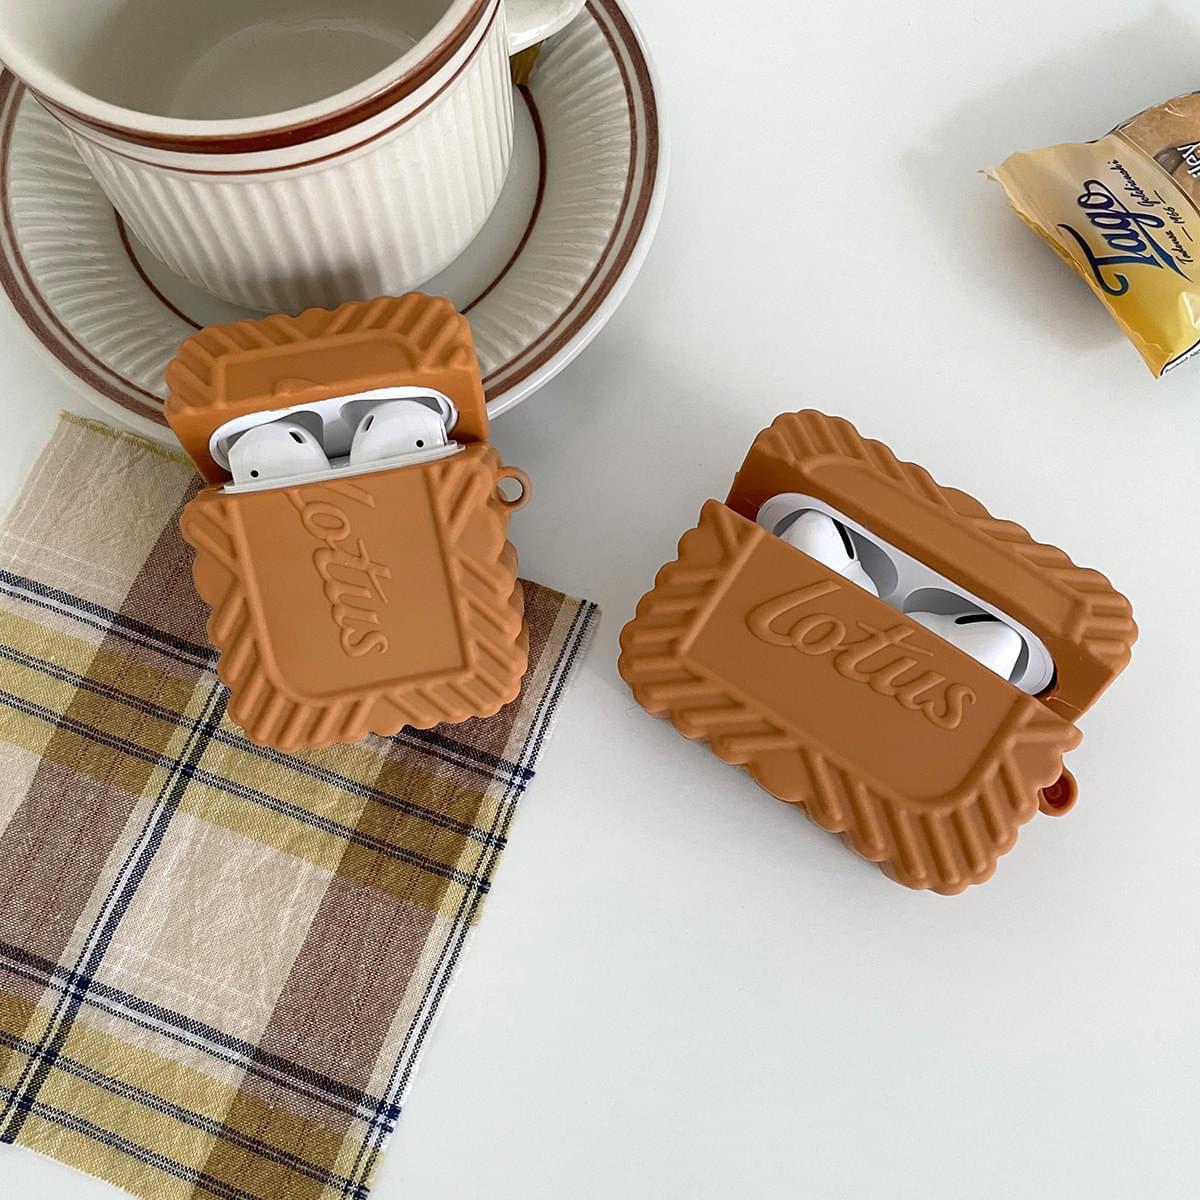 Lotus Cookie AirPod Case